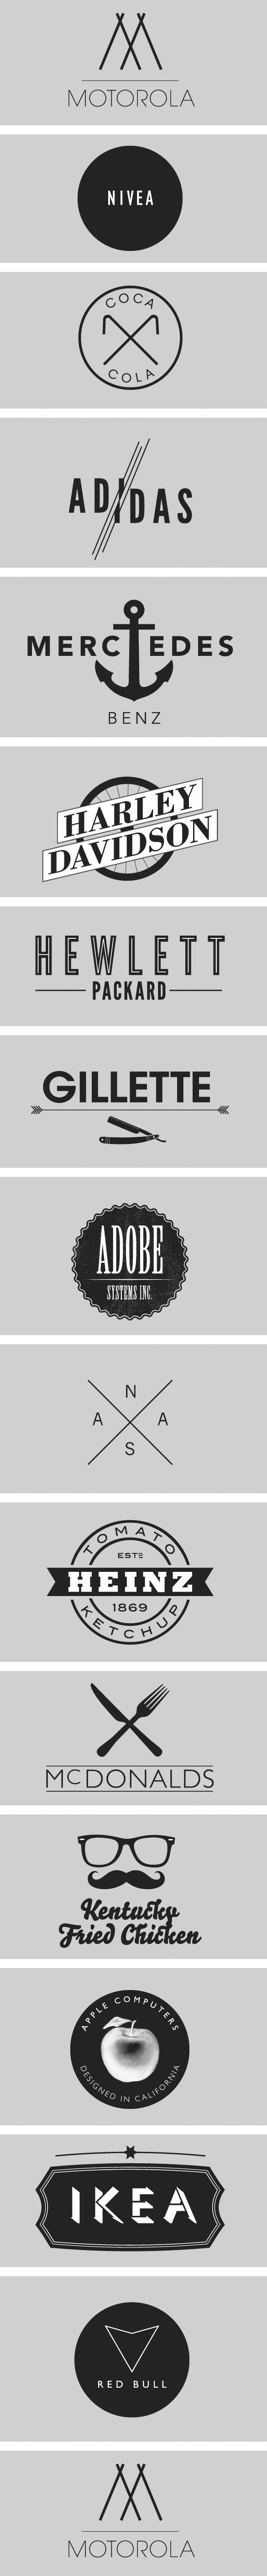 Hipster Logos Style :D #graphism.fr    http://graphism.fr/dcryptez-le-logos-la-mode-hipster